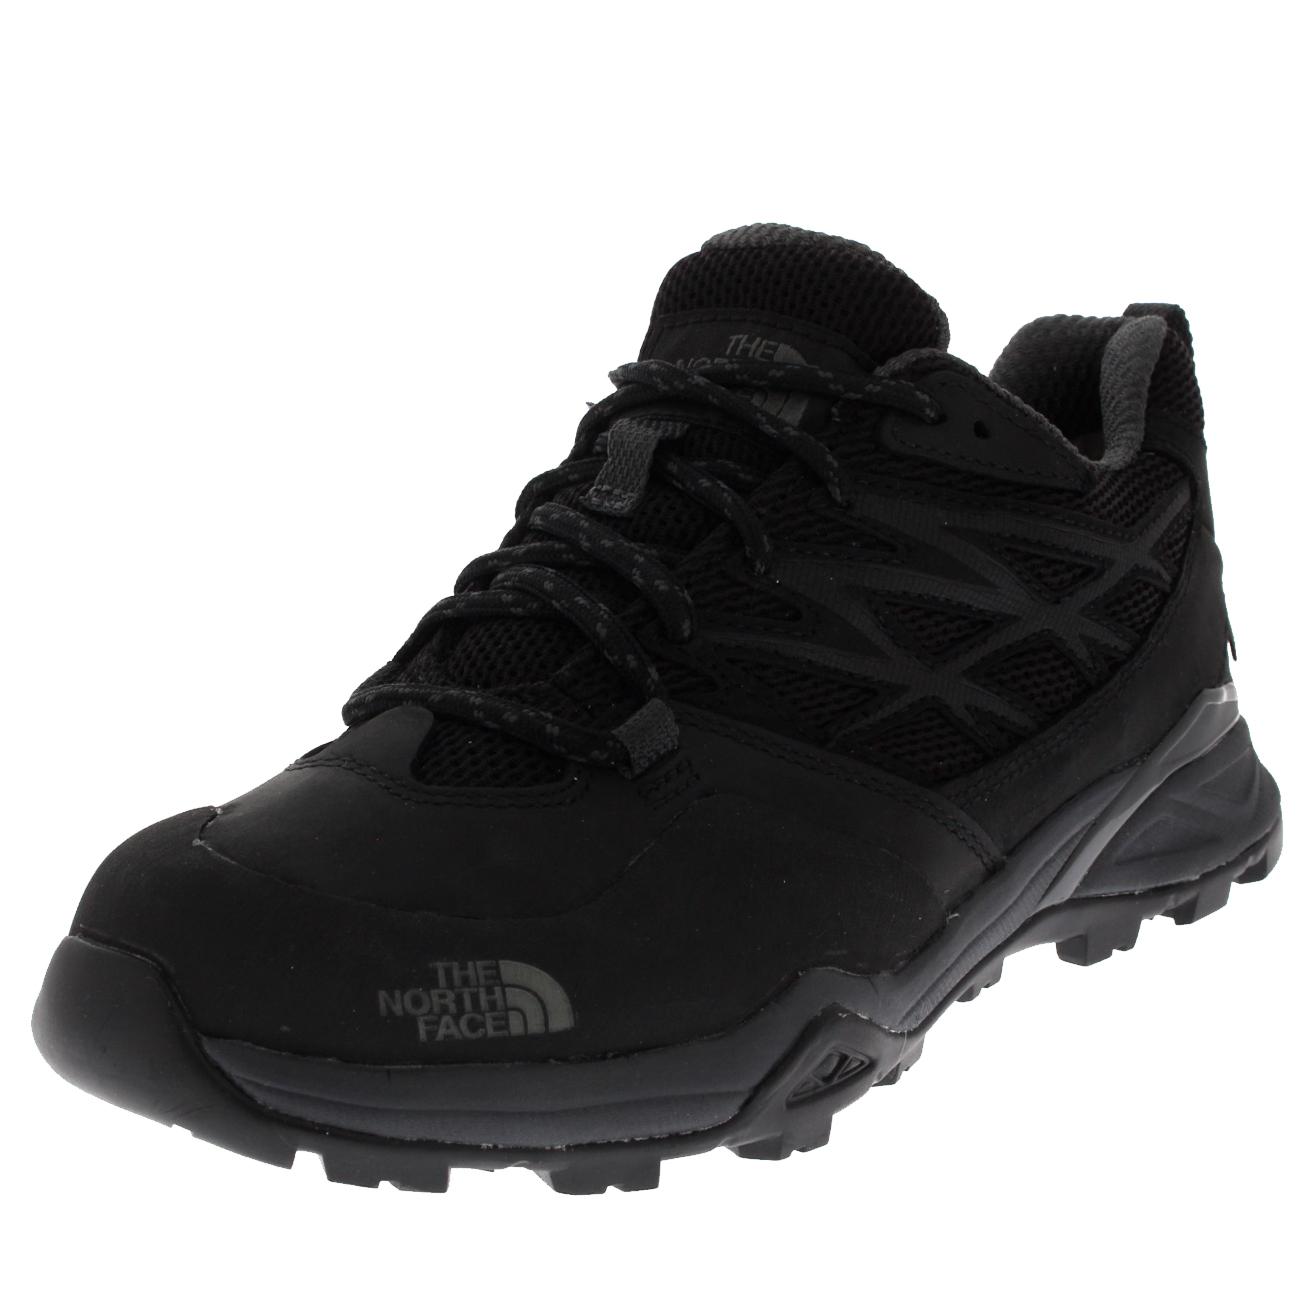 c8d3130732c Womens The North Face Hedgehog Hike Gore Tex Waterproof Hiking Trainers UK  3-10